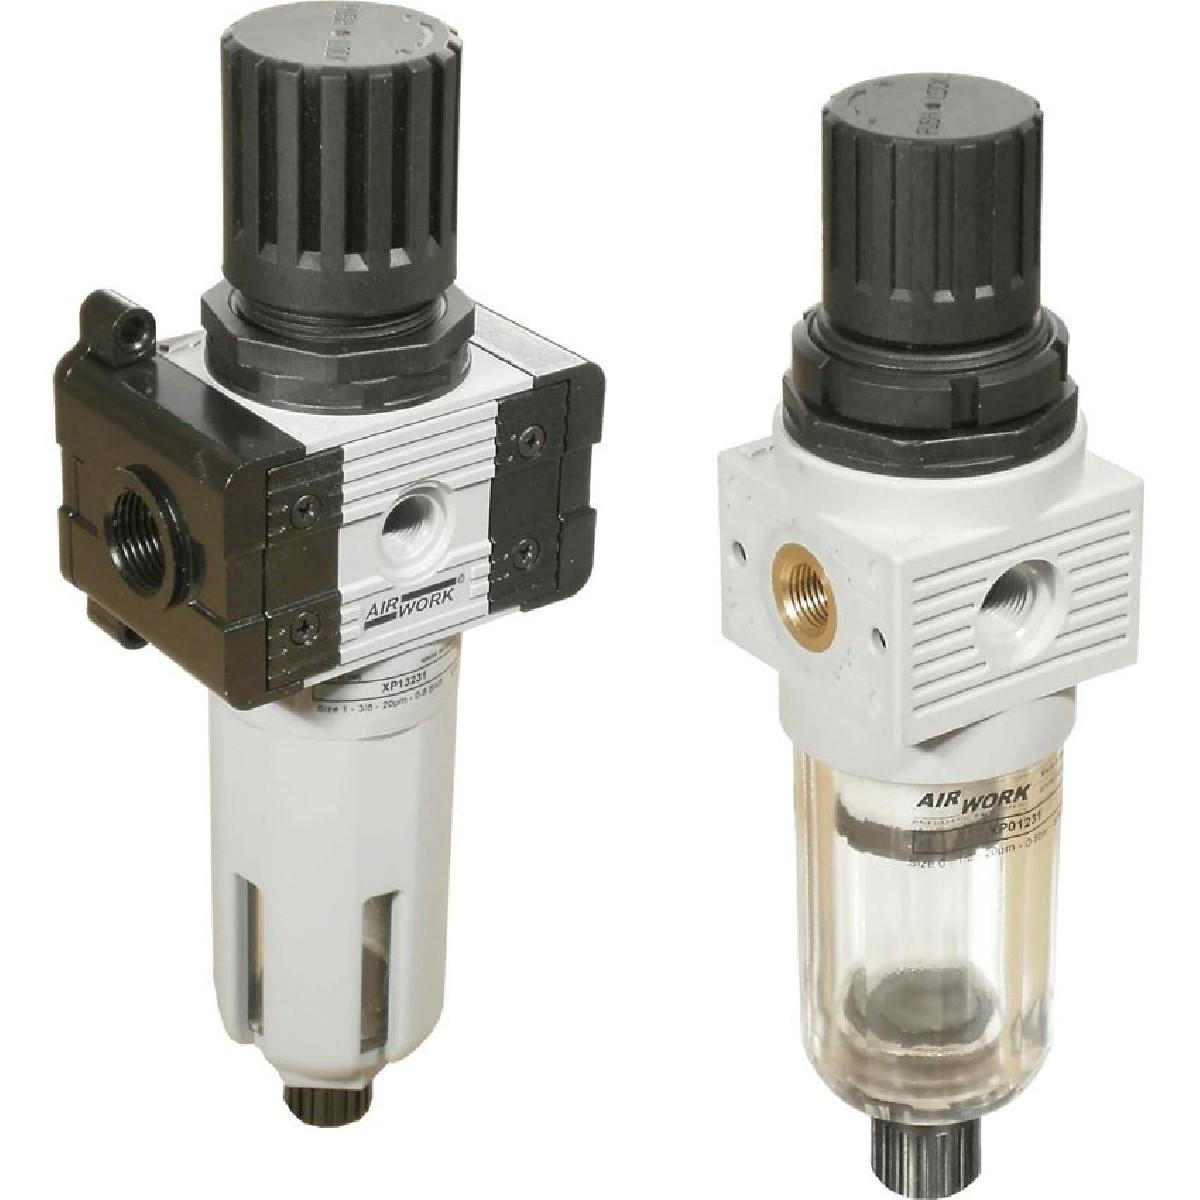 Davair Air treatment - Pneumatic filter regulators